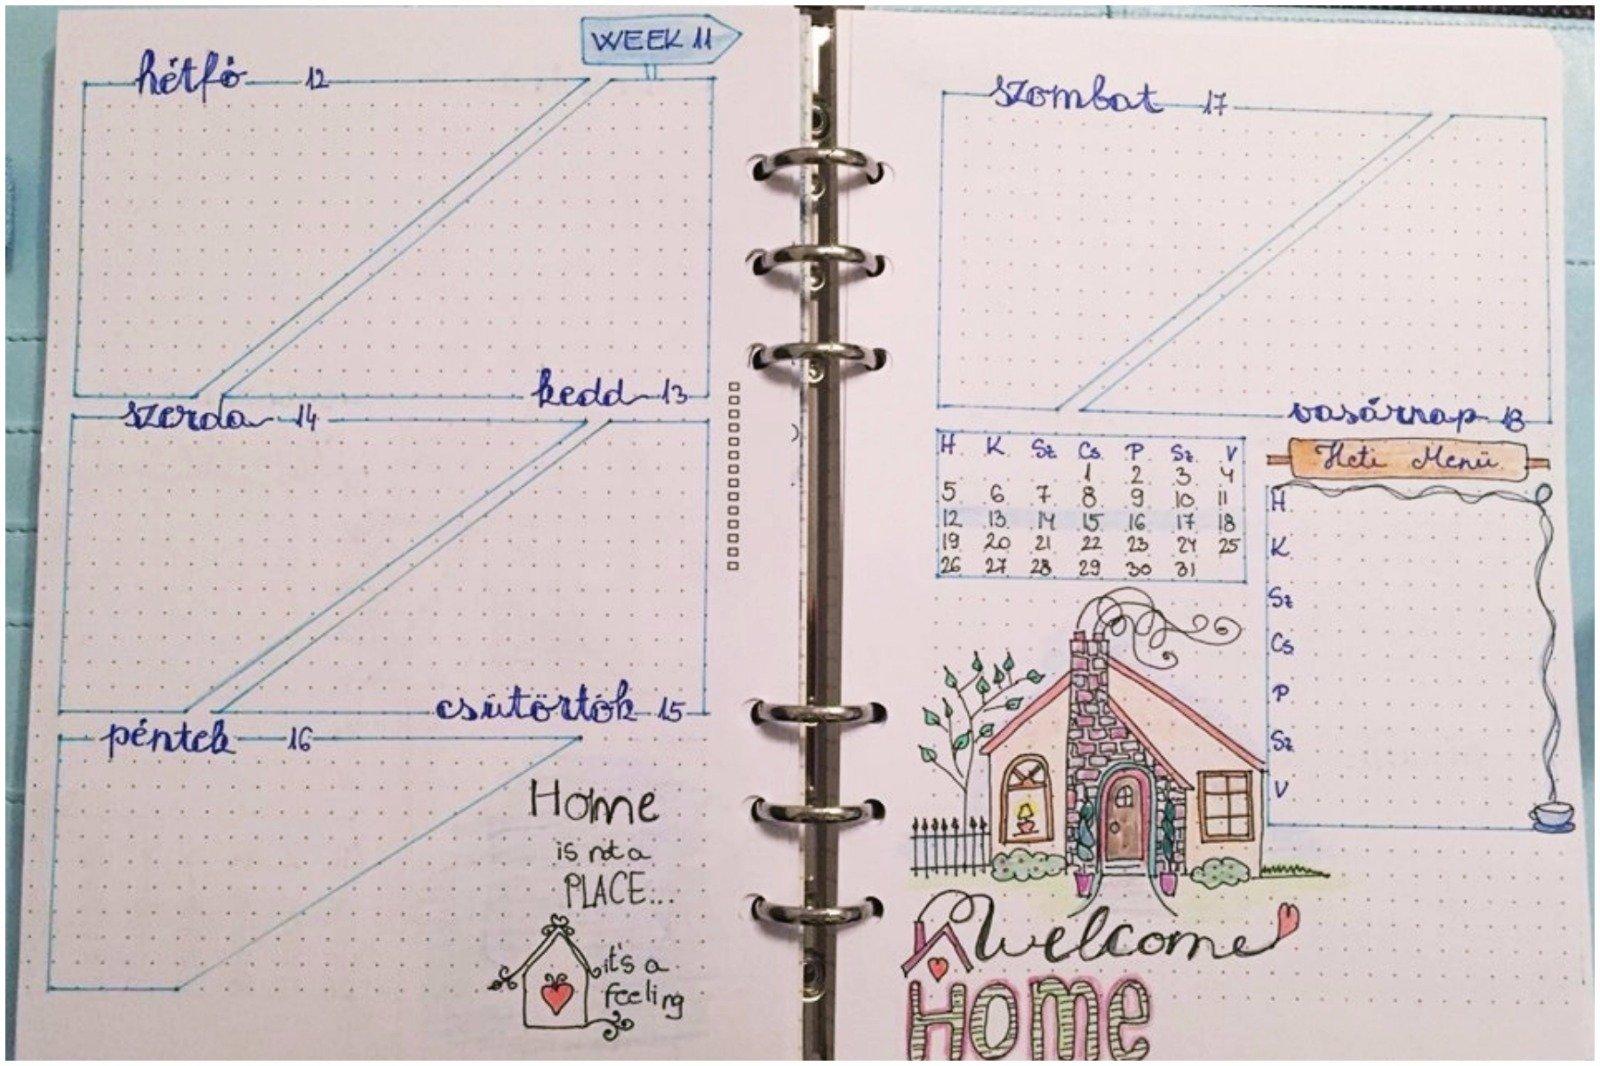 Bullet journal weekly planner - week 11 - itstartswithacoffee.com #march #coverpage #bulletjournal #bujo #weekly #weeklyplanner #bulletjournaling #bujojunkies #bujolove #showmeyourplanner #bujoinspire #bulletjournallove #bulletjournalcommunity #planning #planneraddict #bulletjournaljunkies #planwithme #itstartswithacoffee.com